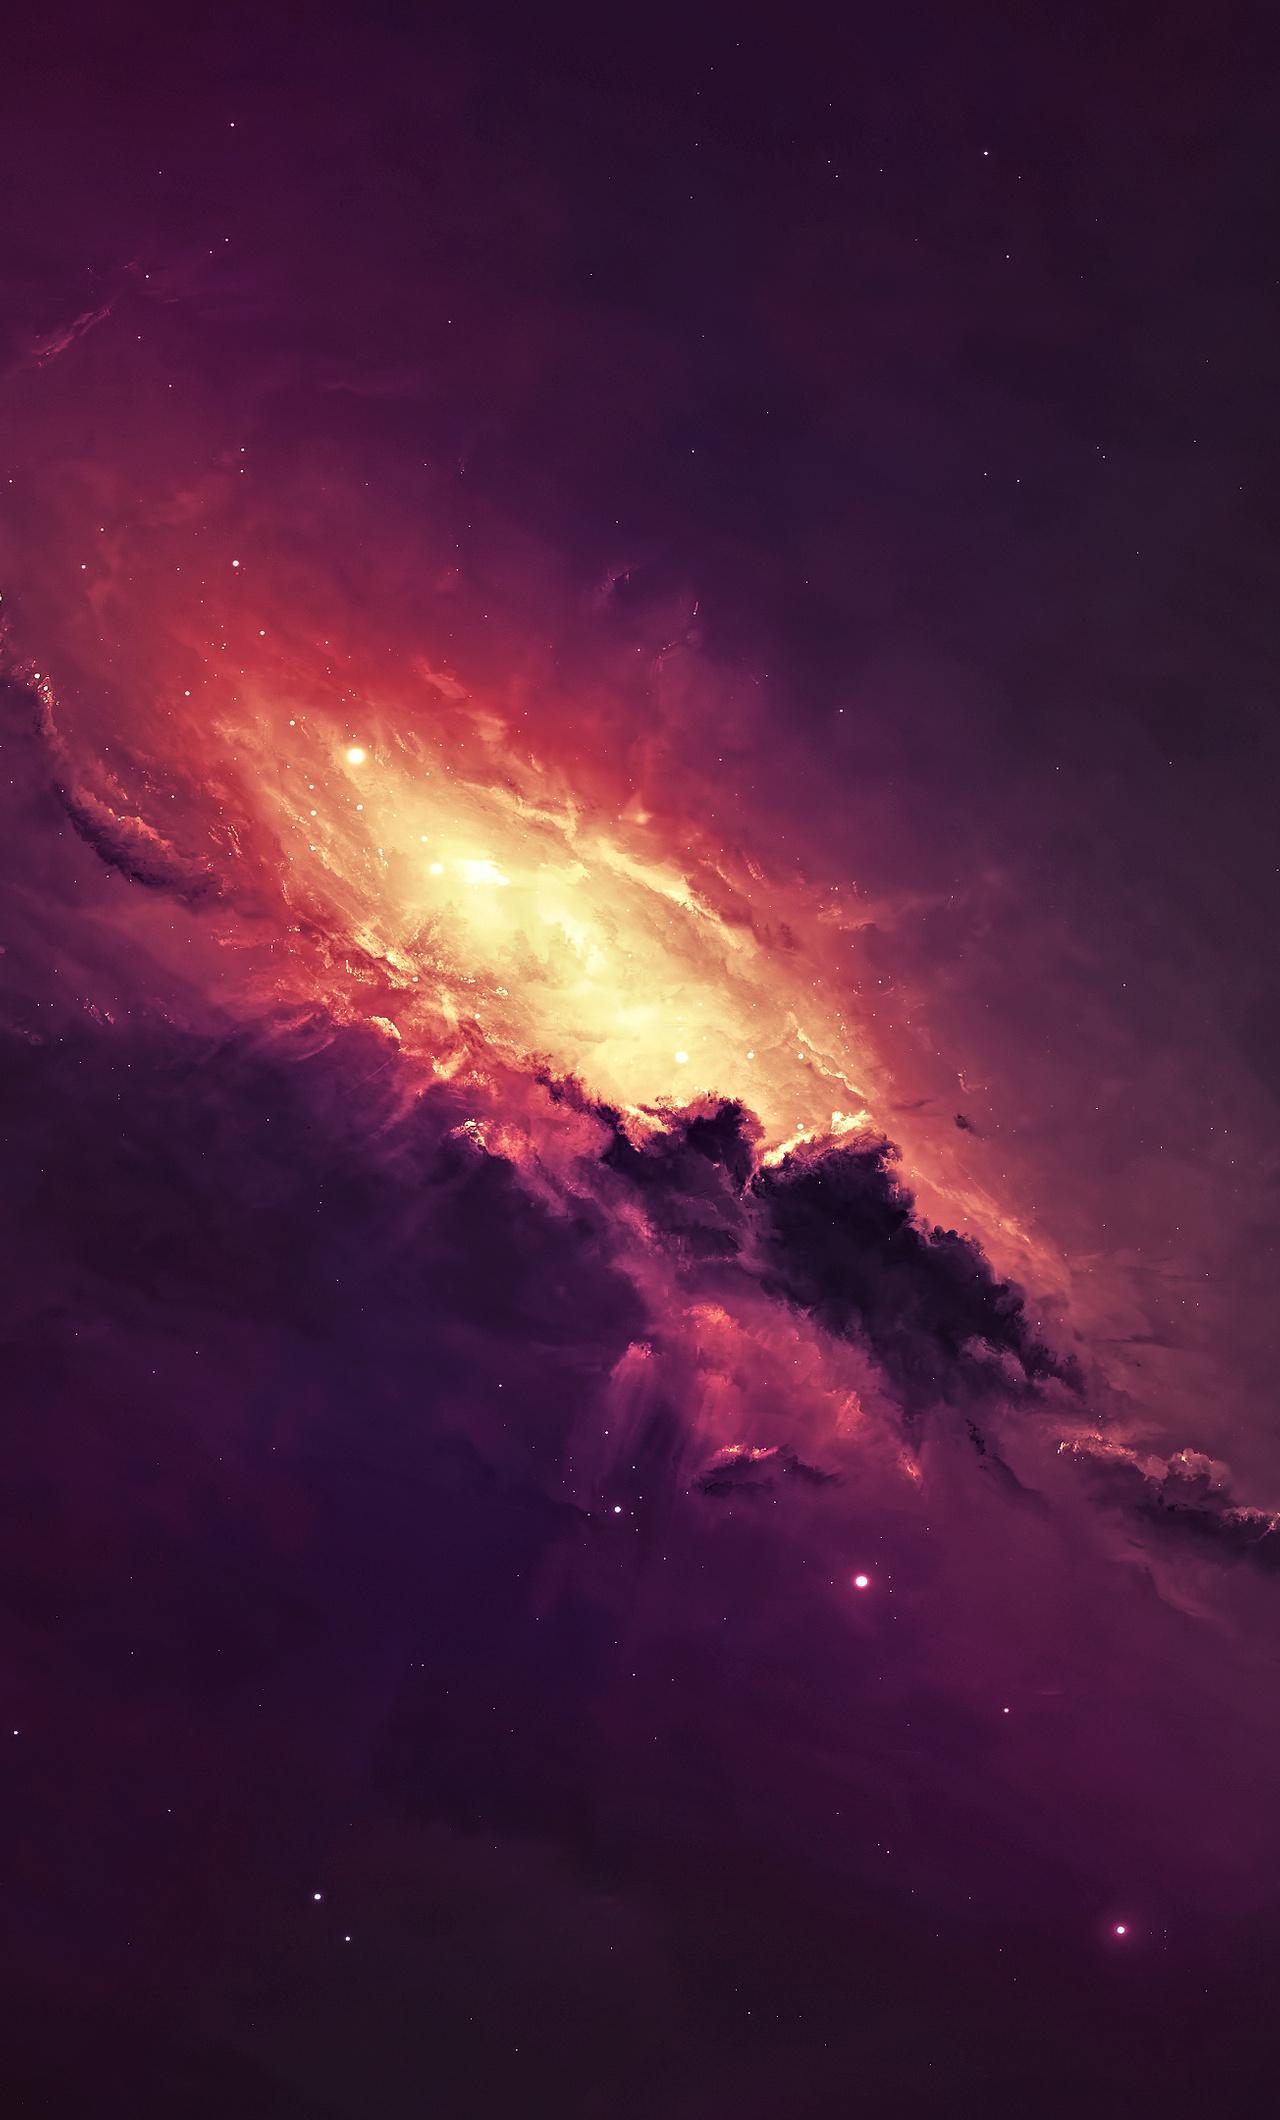 spiral-galaxy-space-stars-universe-4k-5i.jpg